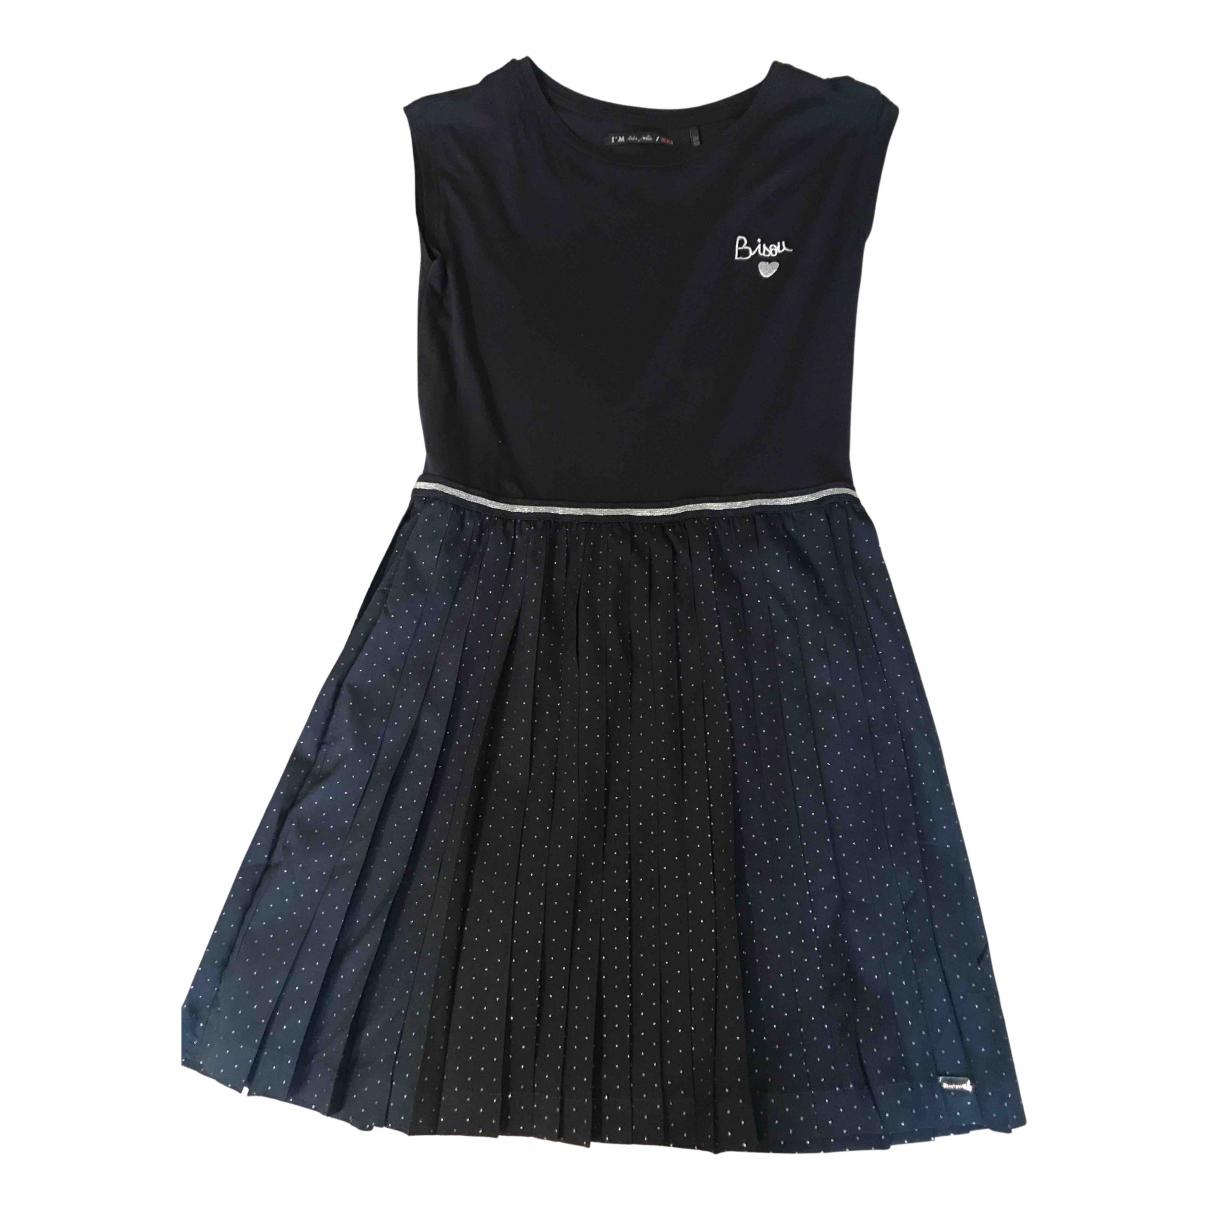 Ikks N Navy Cotton - elasthane dress for Kids 12 years - XS FR